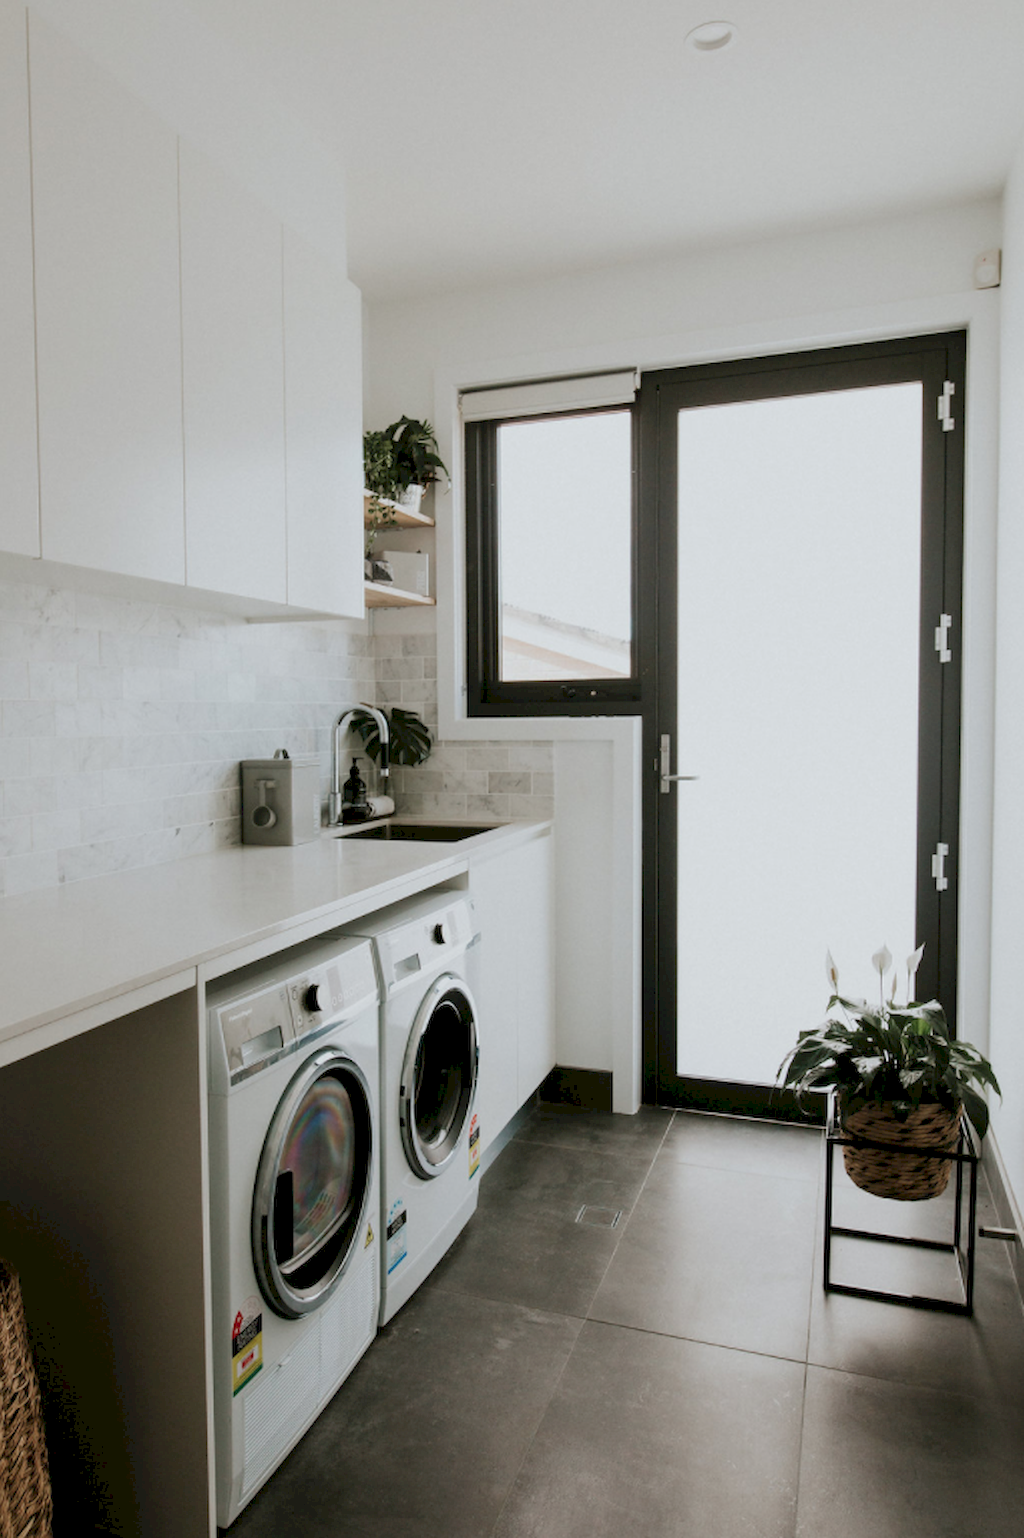 90 DIY Small Laundry Room Organization Ideas   Laundry ... on Small Laundry Room Organization Ideas  id=16806